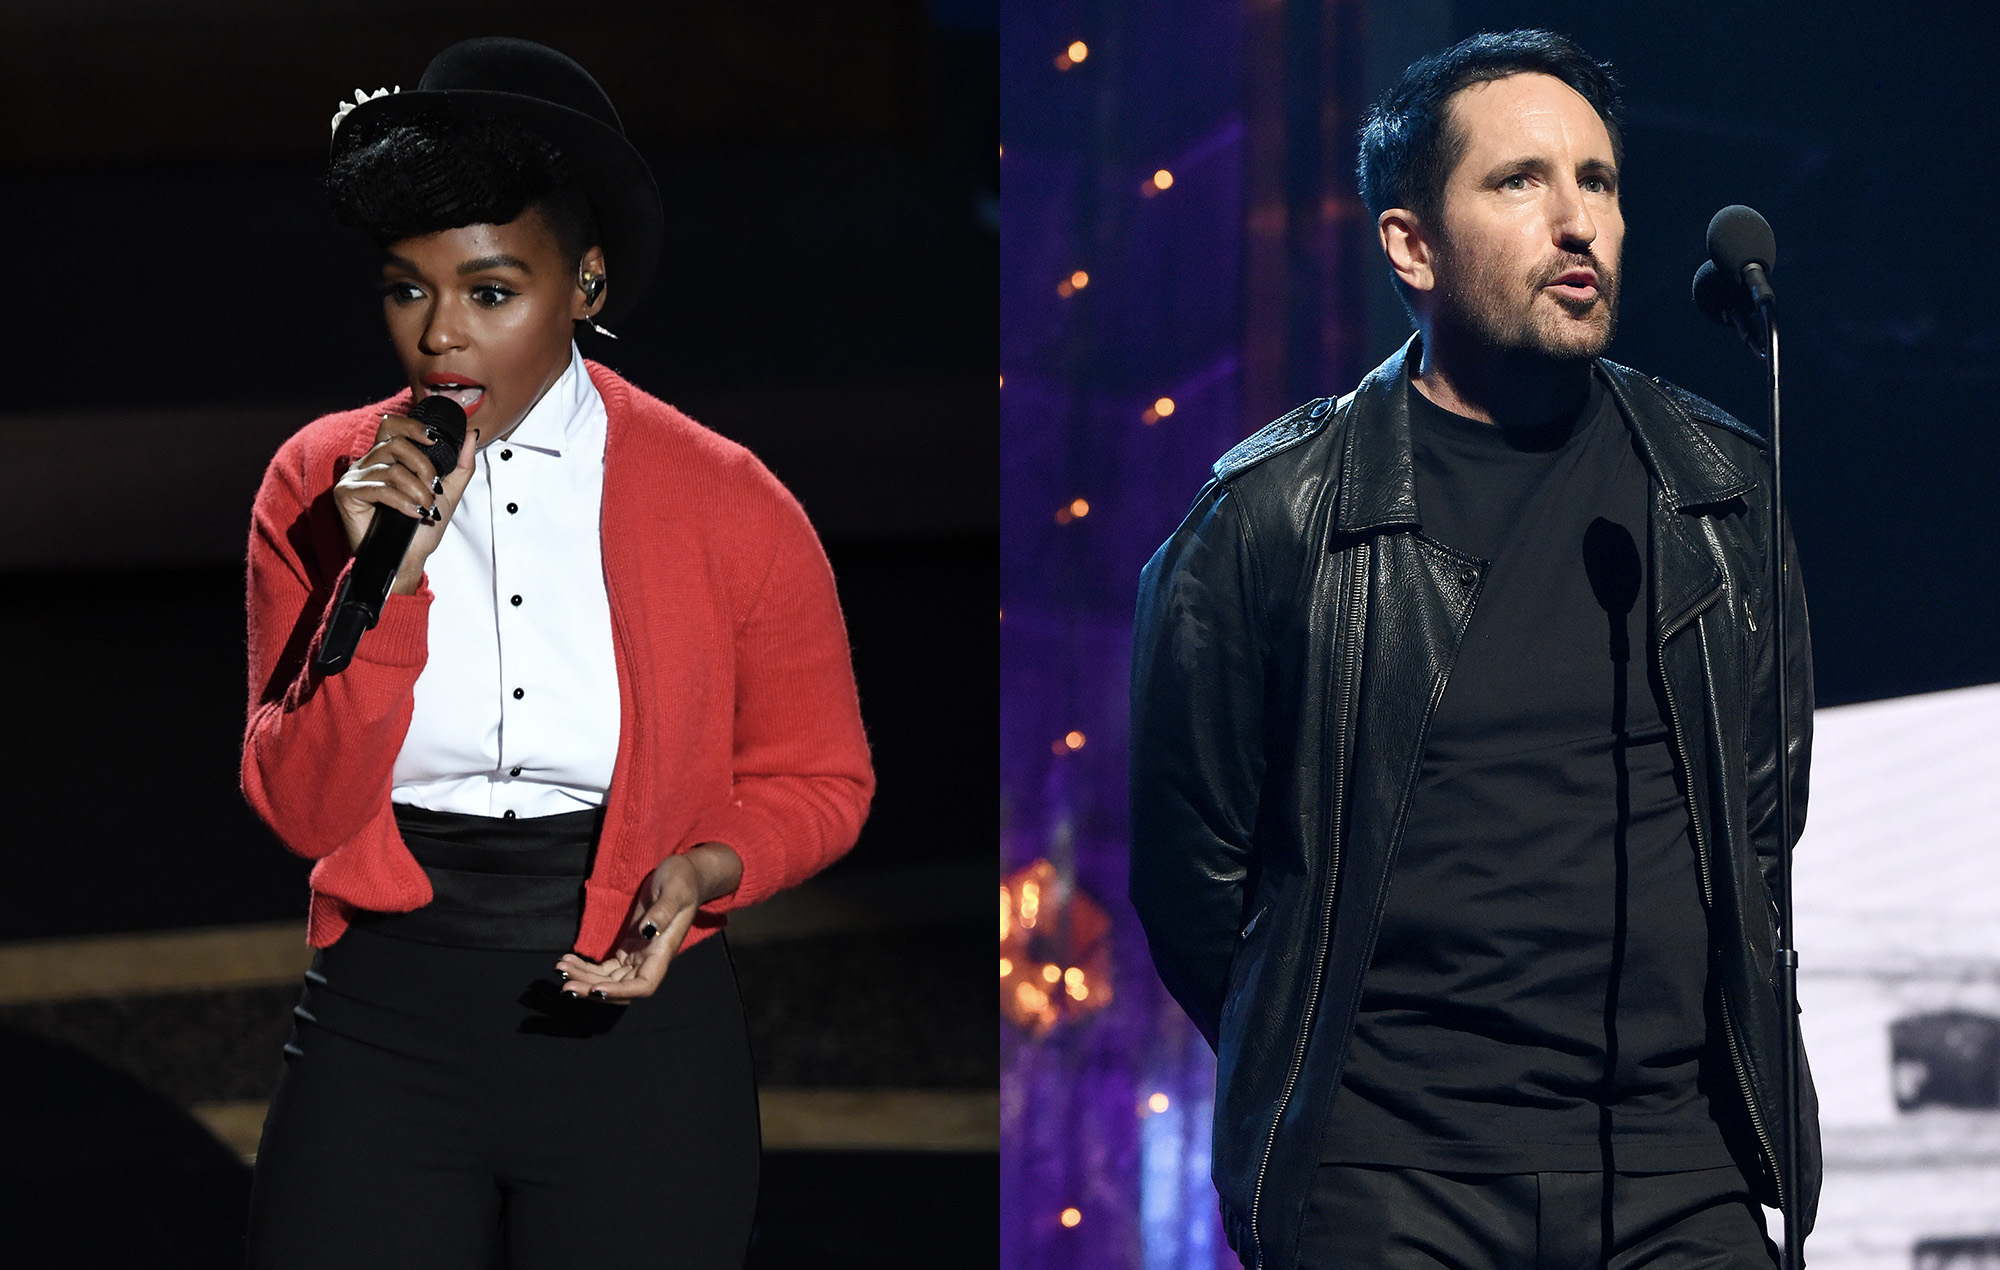 Oscars 2021 Best Original Song and Score shortlists announced: Janelle Monáe, Trent Reznor, Celeste and more